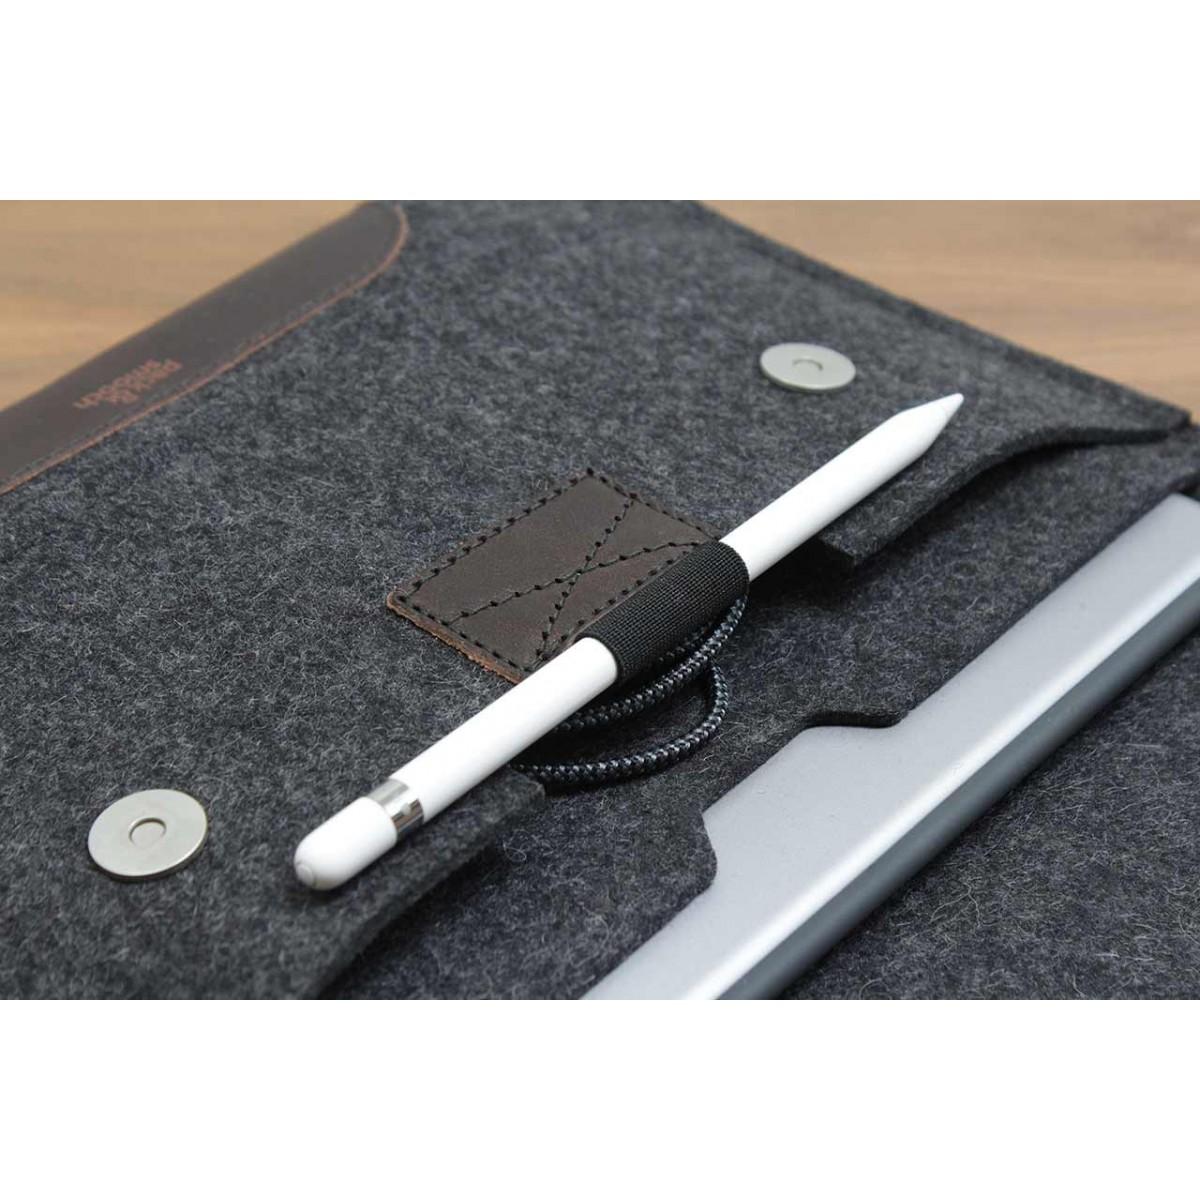 "iPad Pro 9.7"" Hülle, Sleeve ""Hampshire"" 100% Merino Wollfilz, pflanzlich gegerbtes Leder"